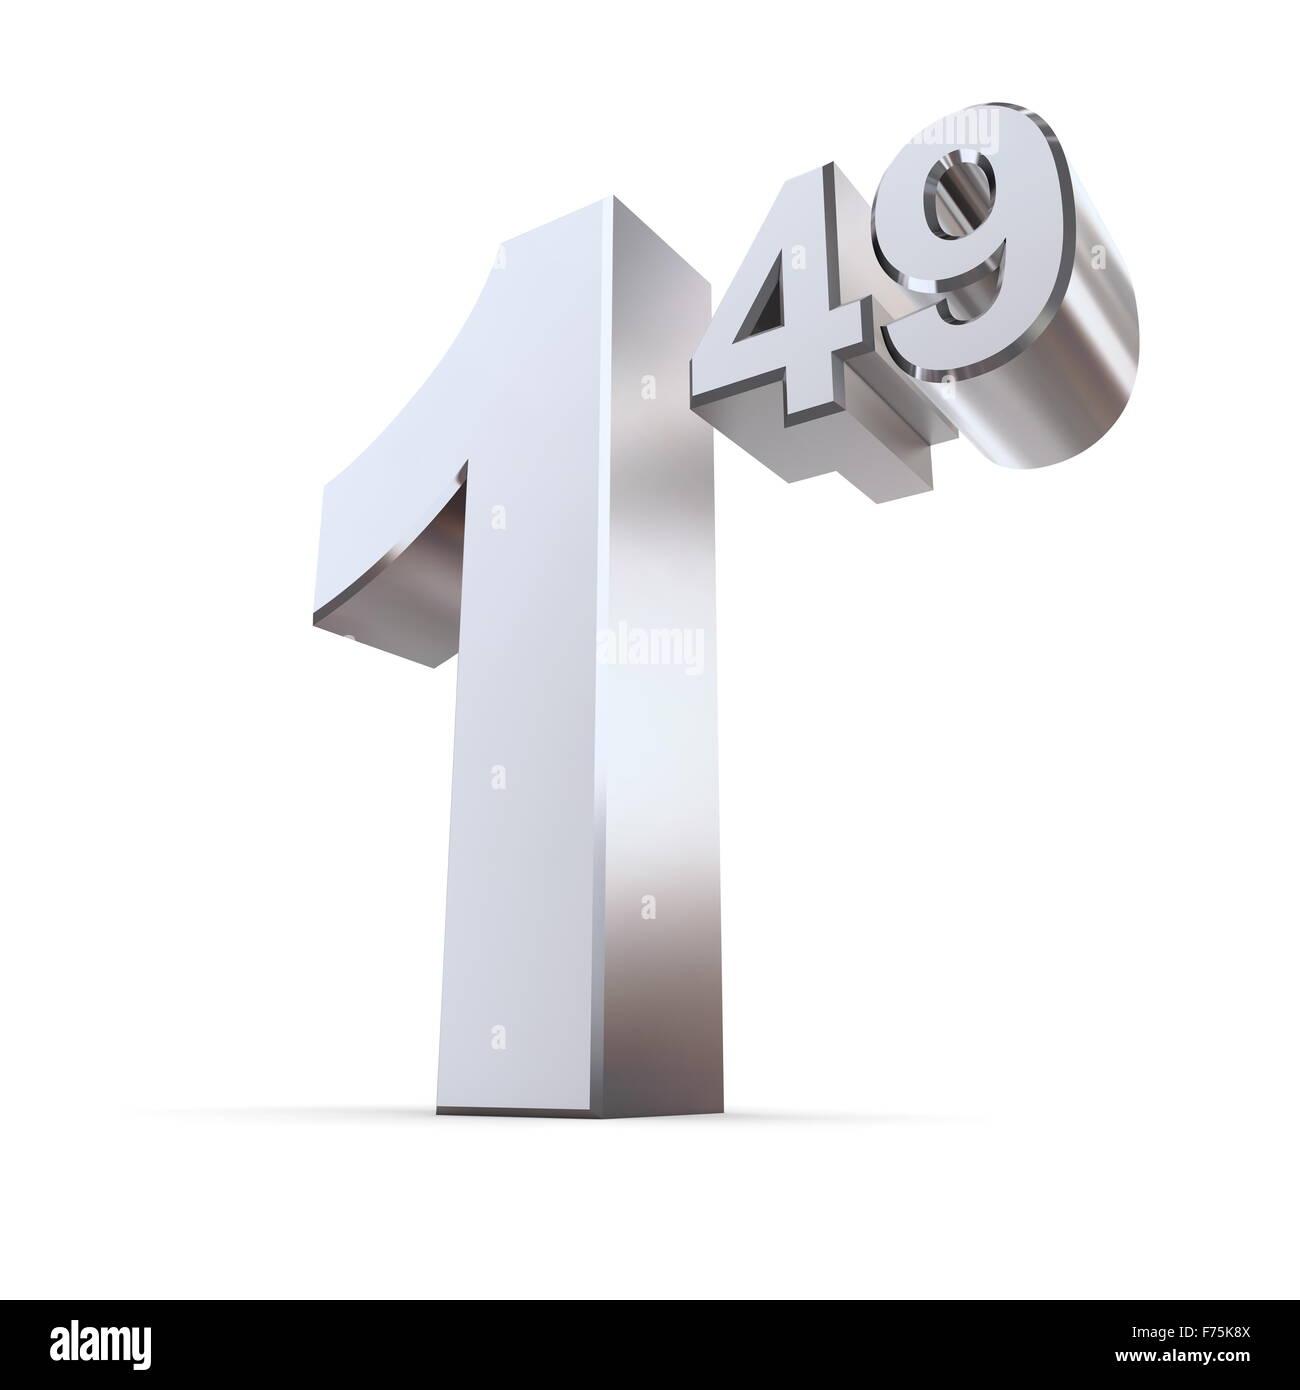 Número de etiqueta de precio sólido 1.49 - Silver-Chrome brillante Imagen De Stock